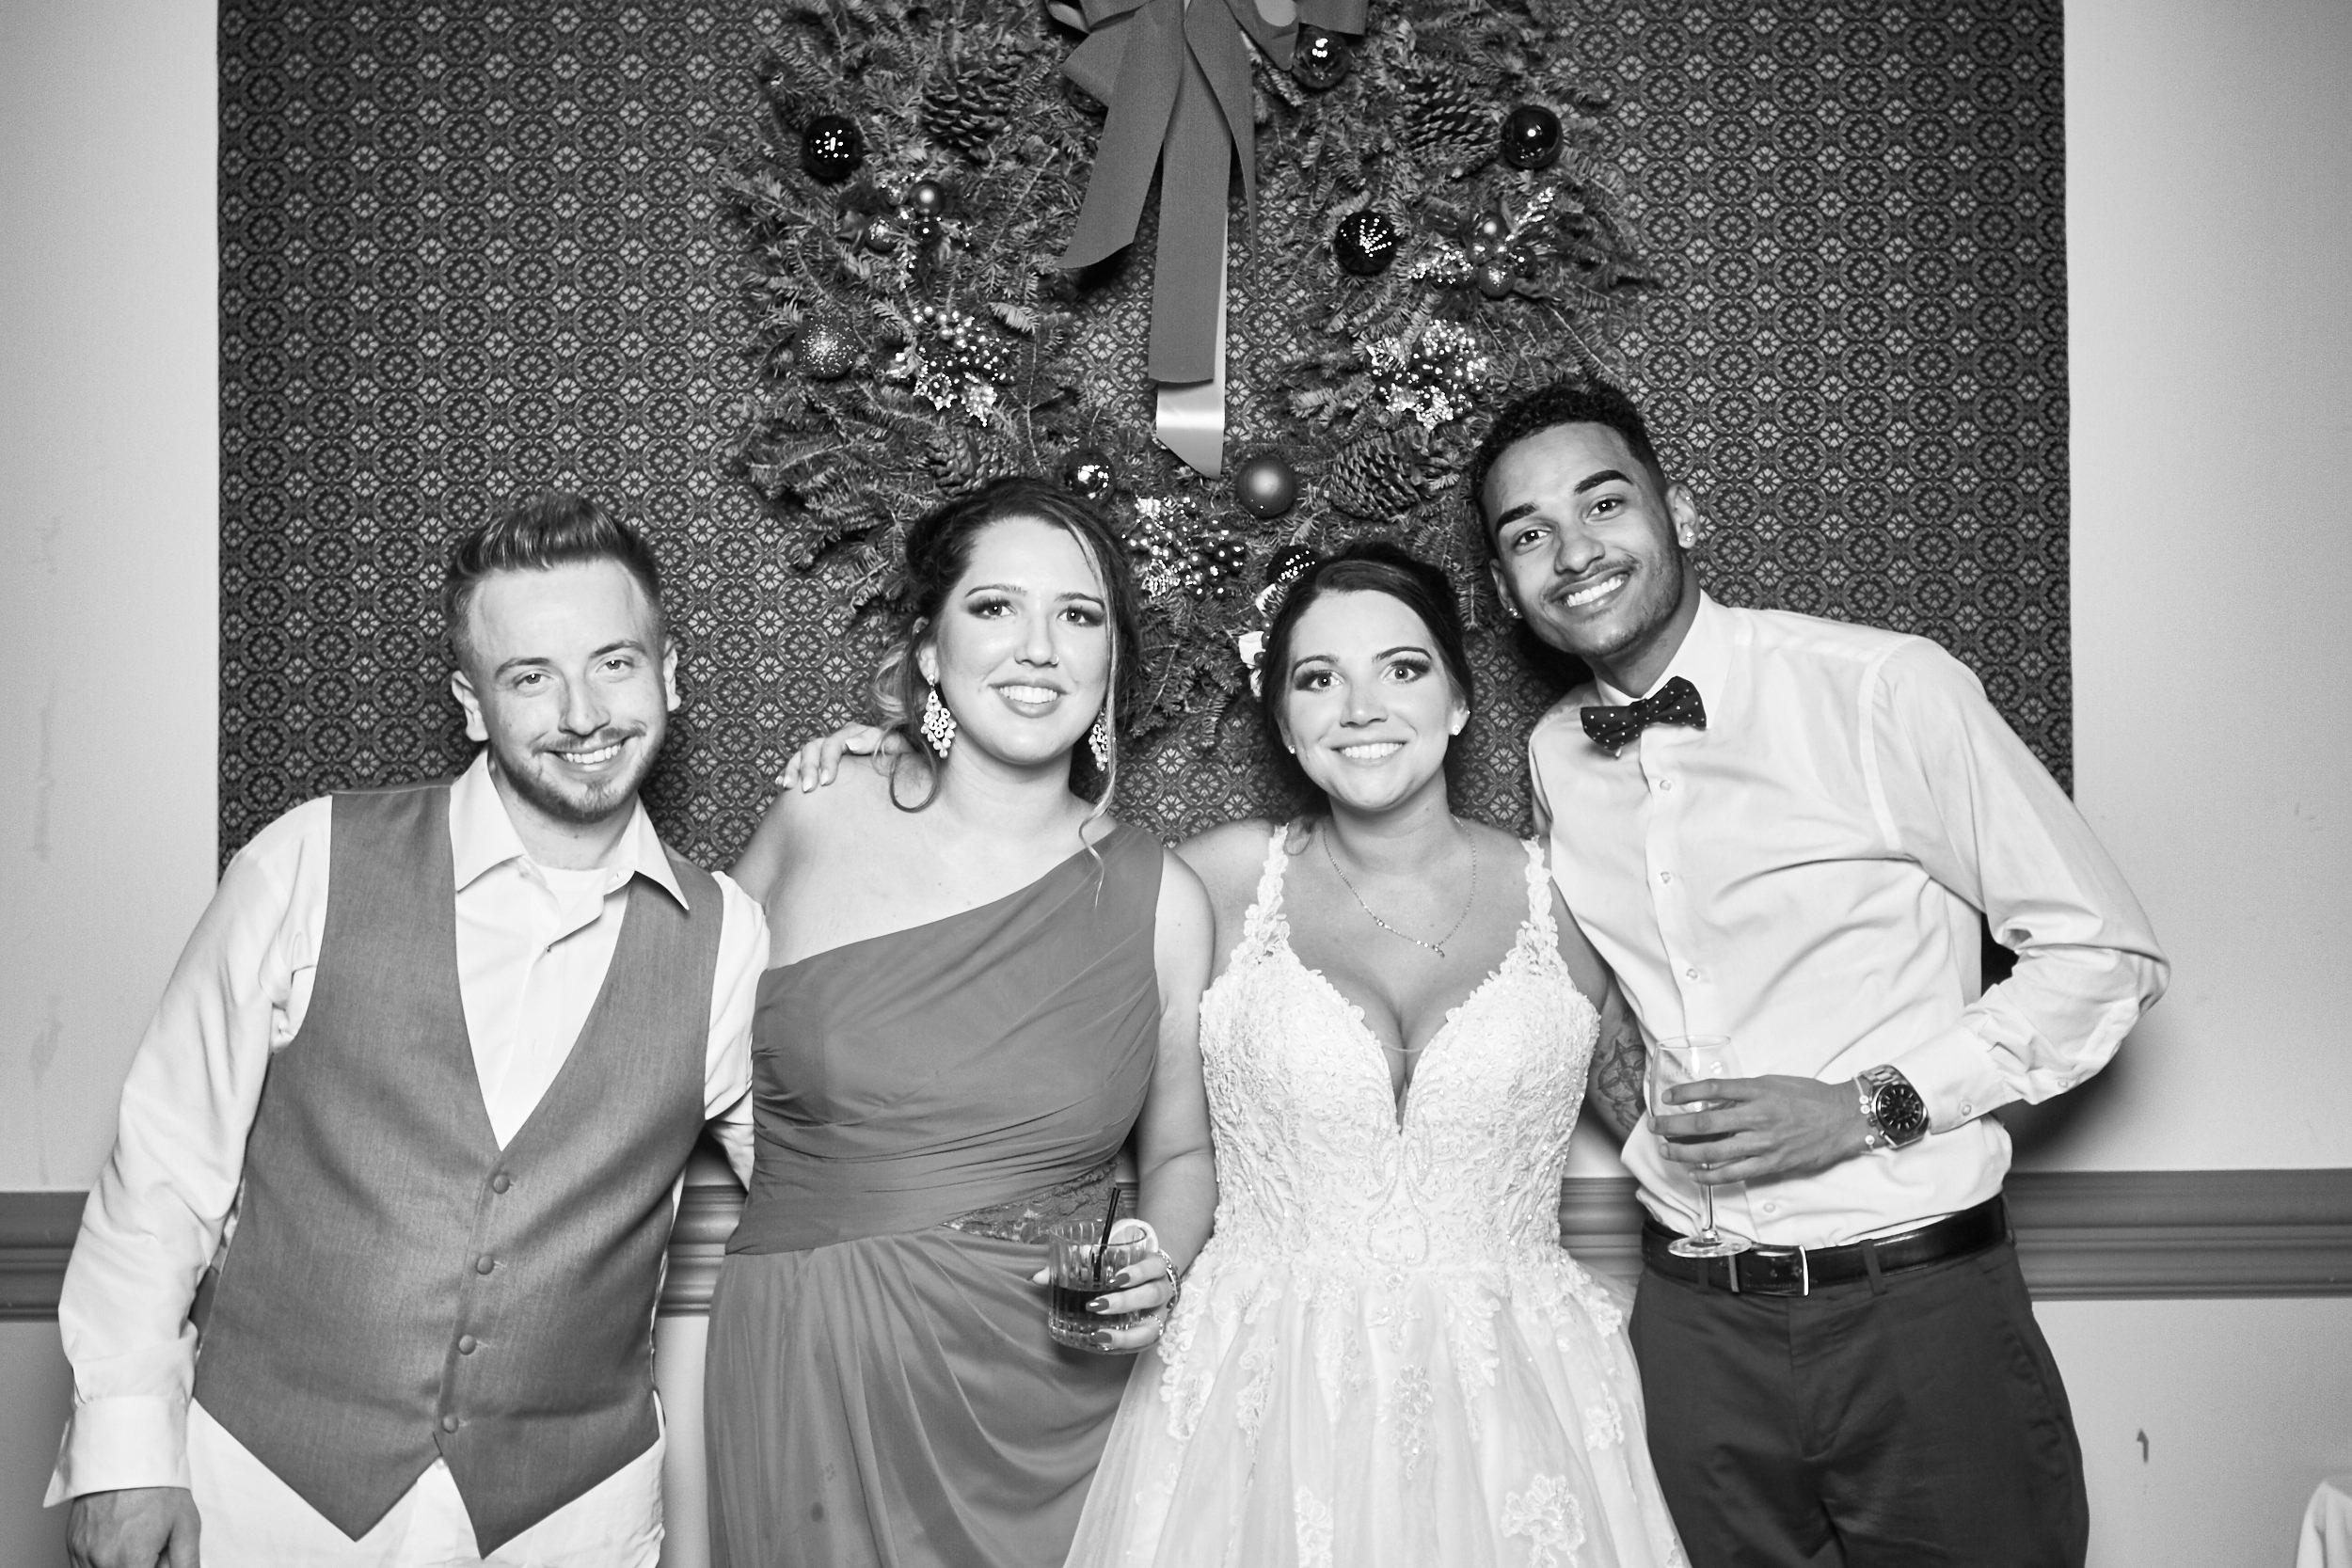 Alexa-James-Wedding-Photo-Booth980.jpg